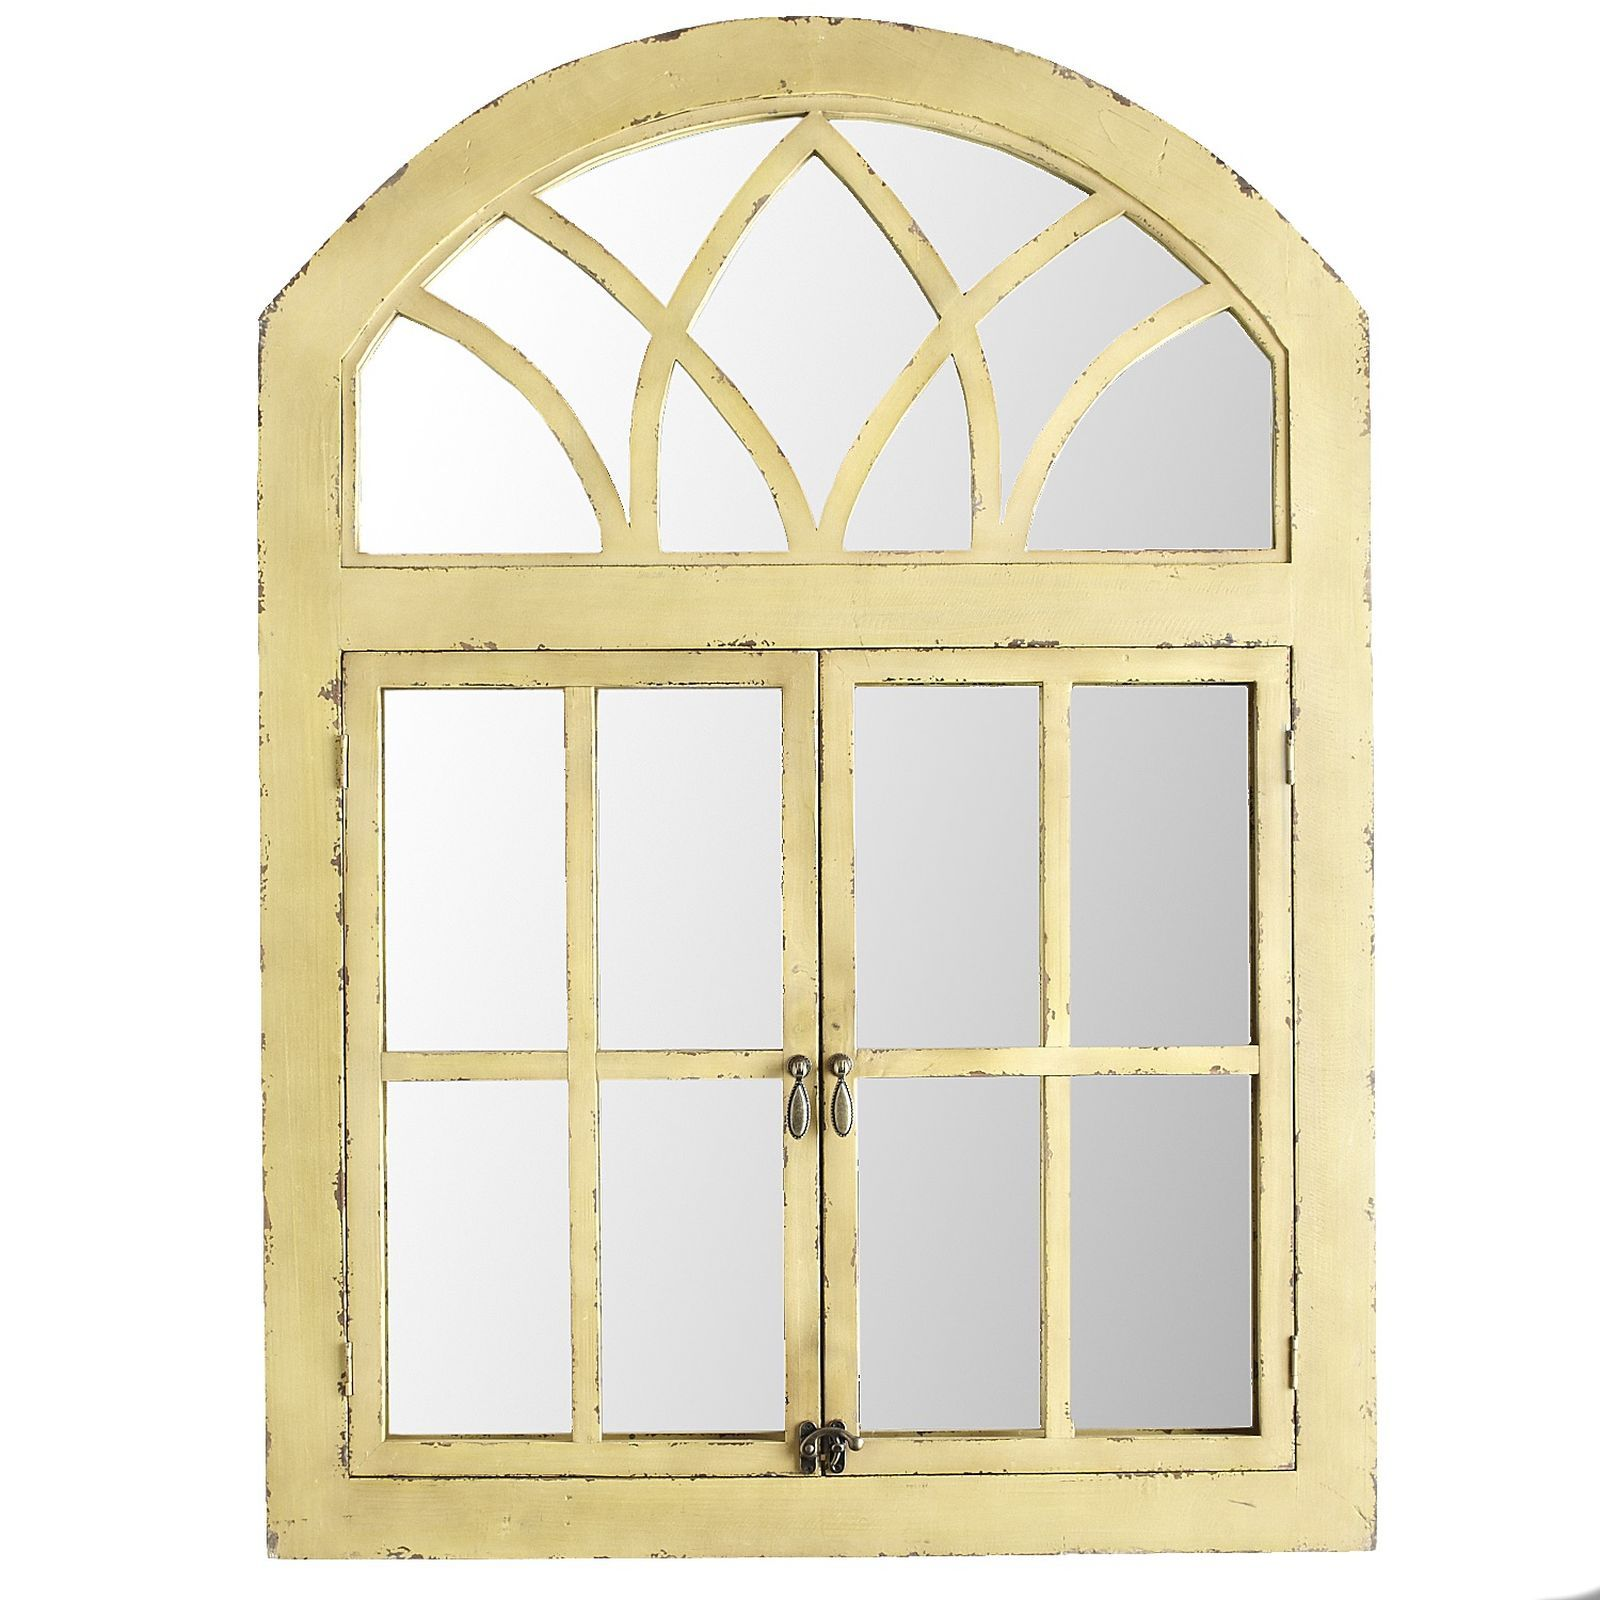 Pier 1 Imports Yellow Garden Window Mirror | Eclectic modern, Garden ...